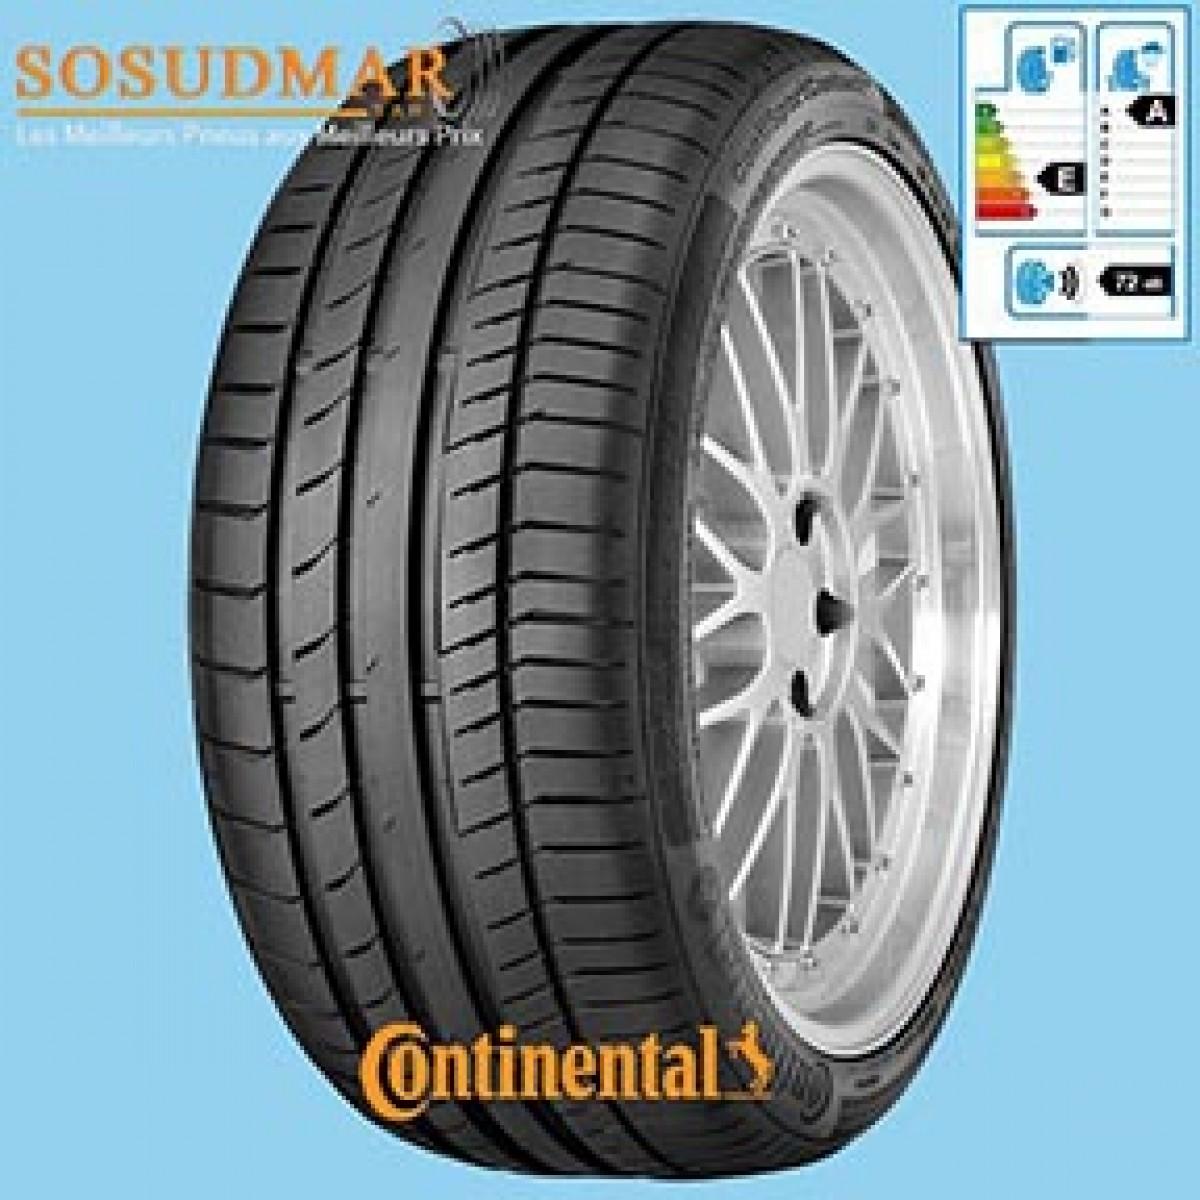 pneu continental 225 50r17 98y